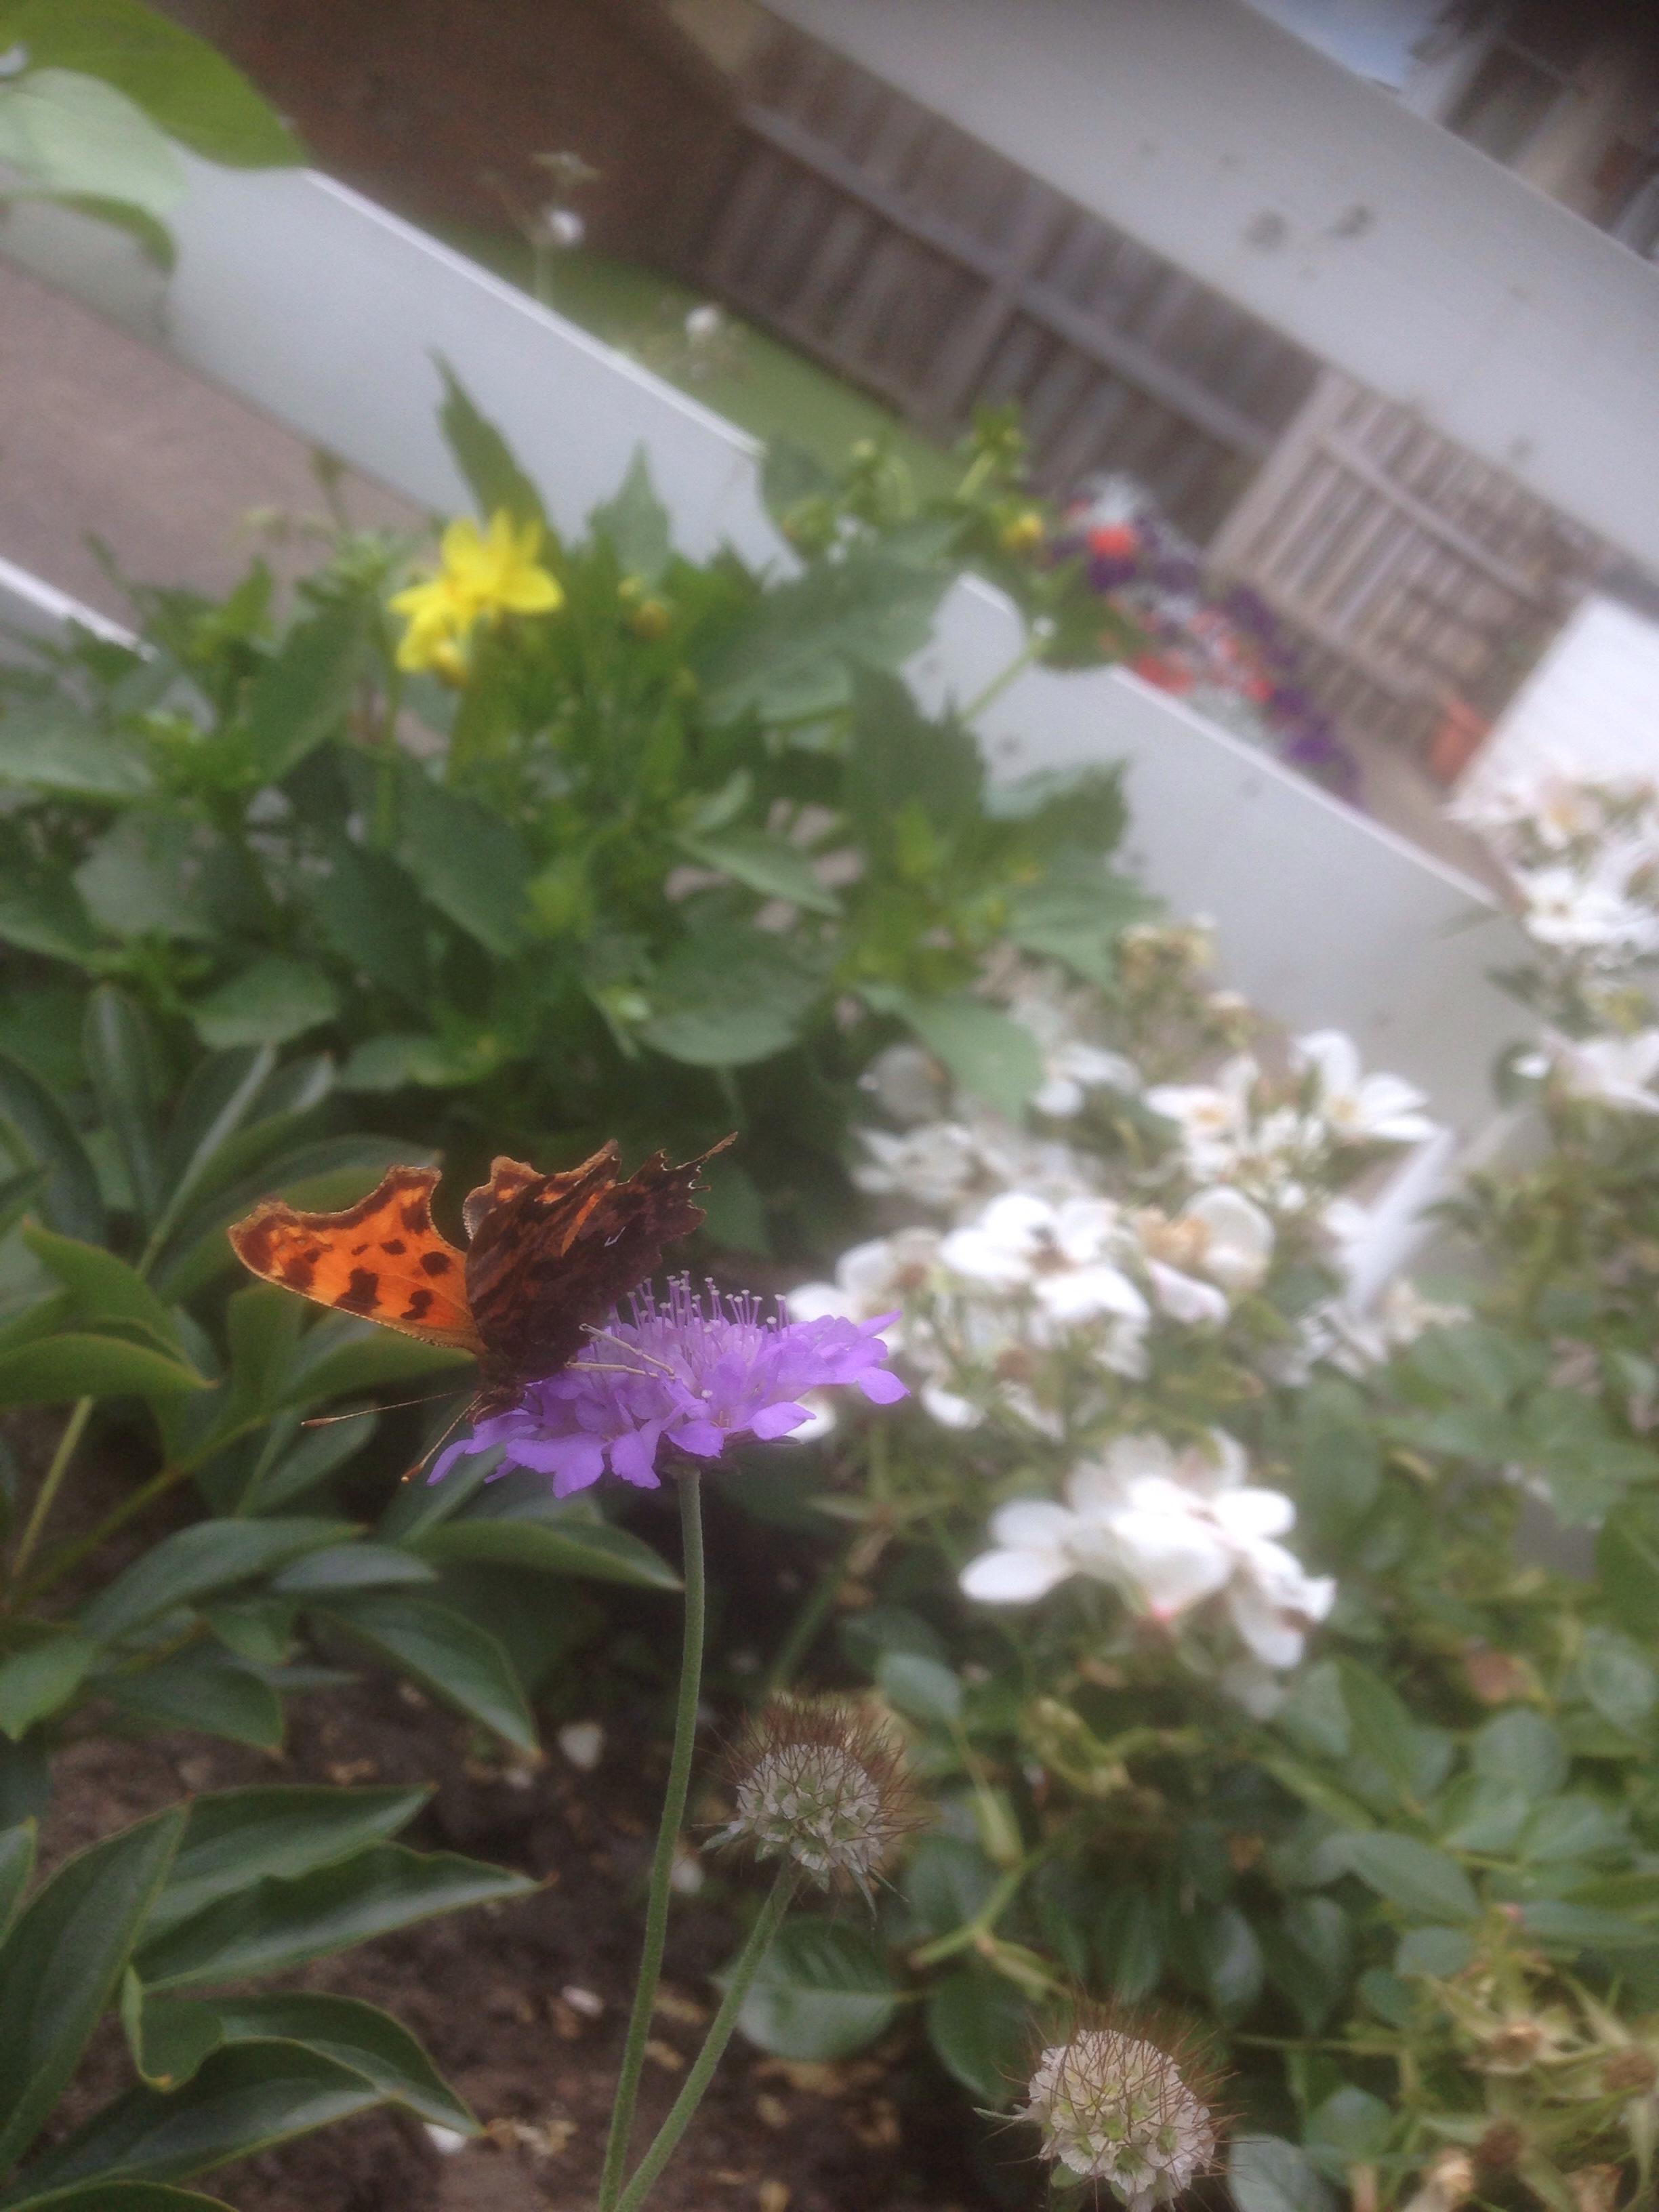 Poem: Waiting For Gardenias